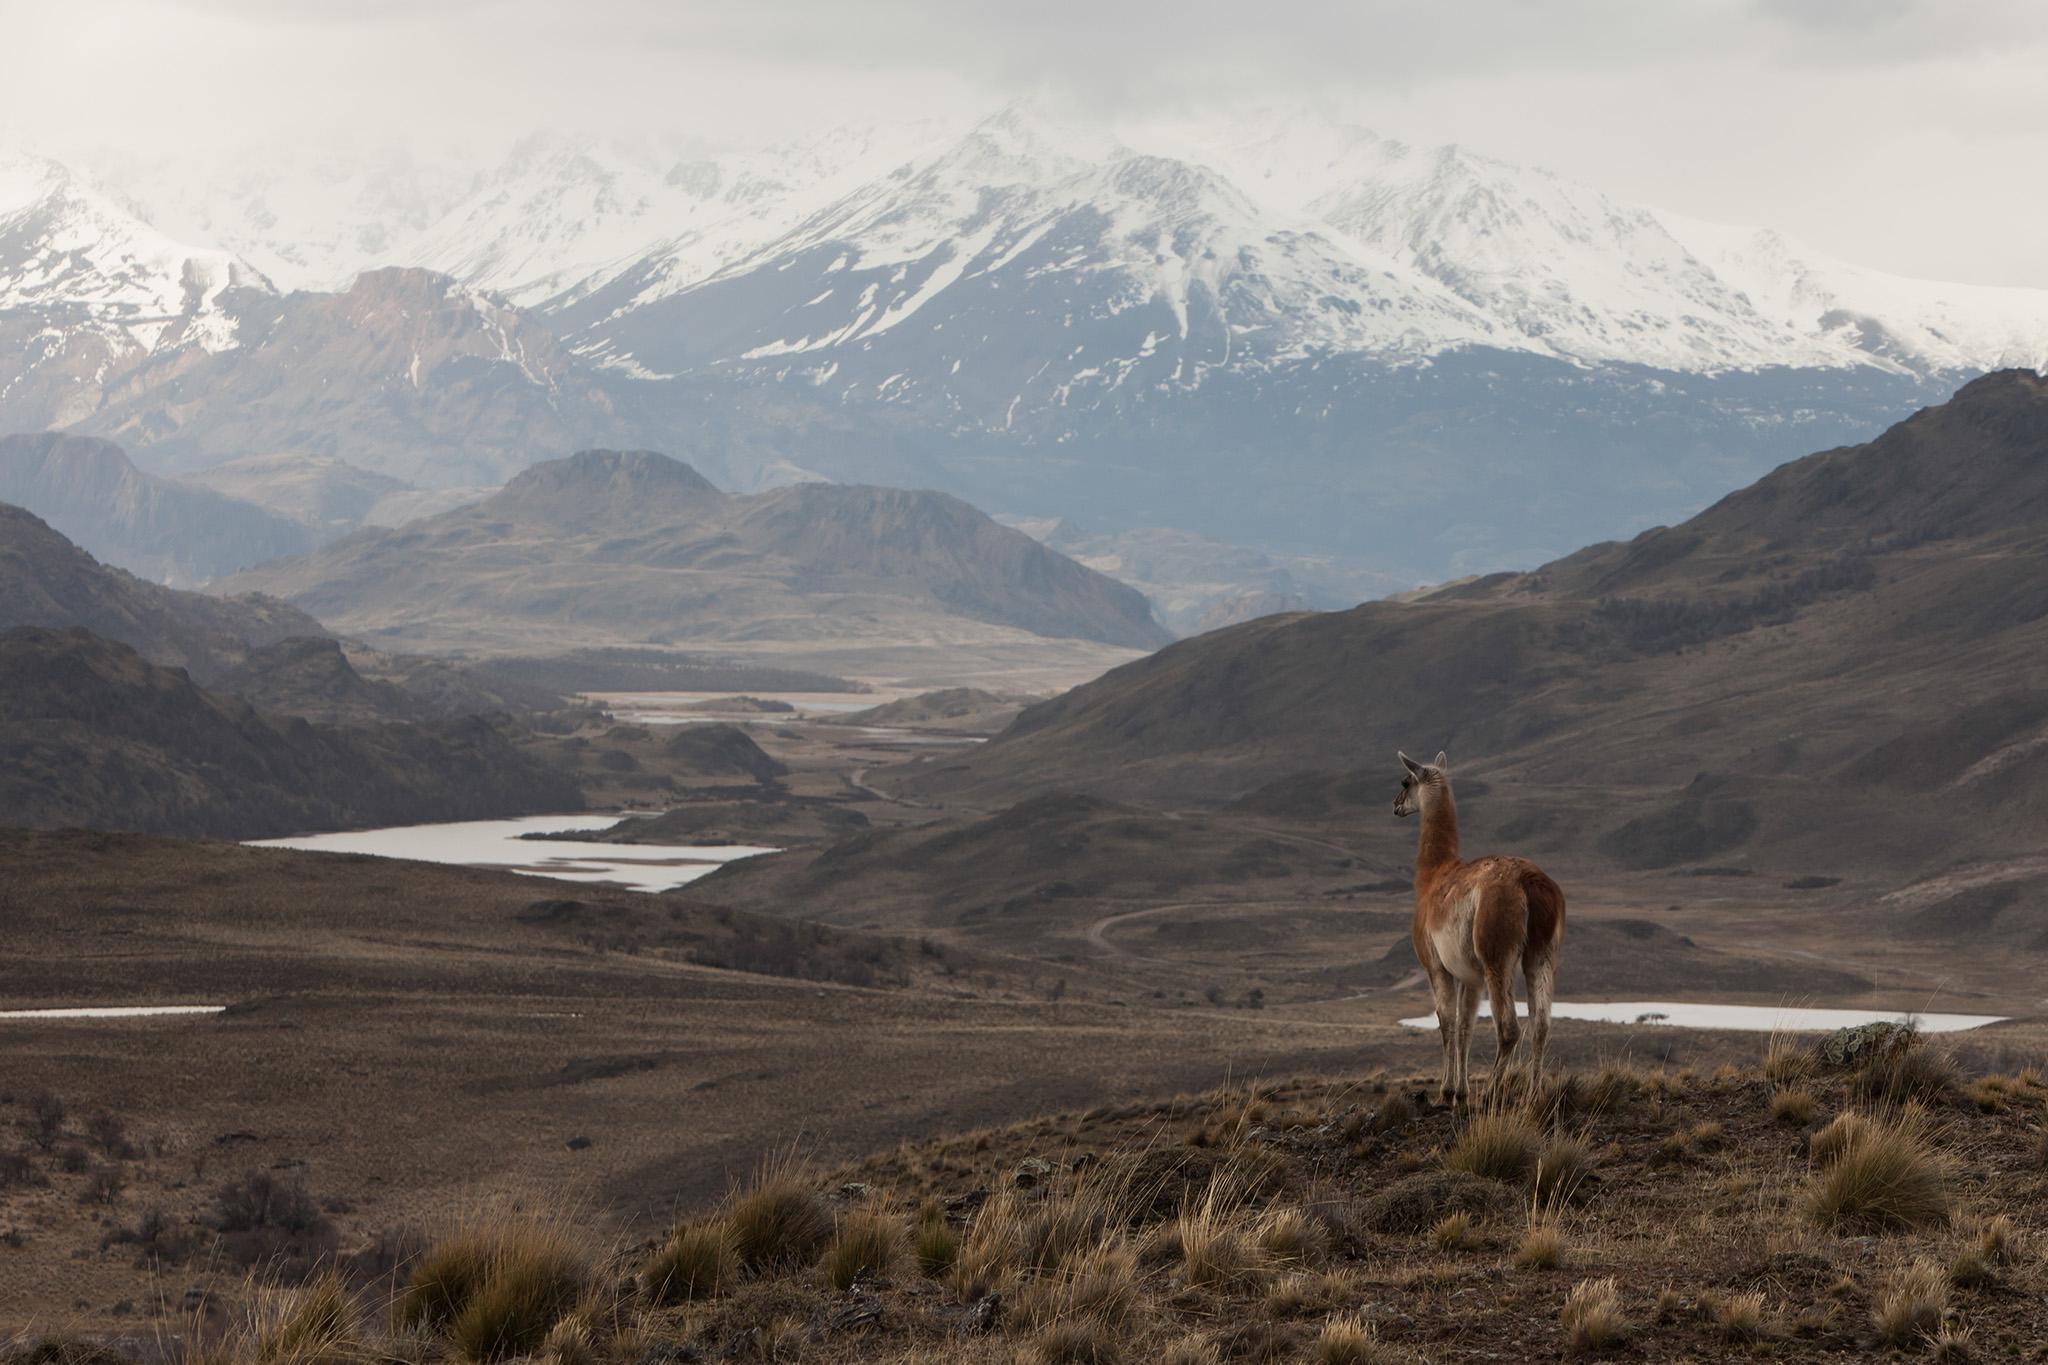 029-TW-Patagonia-140829.jpg